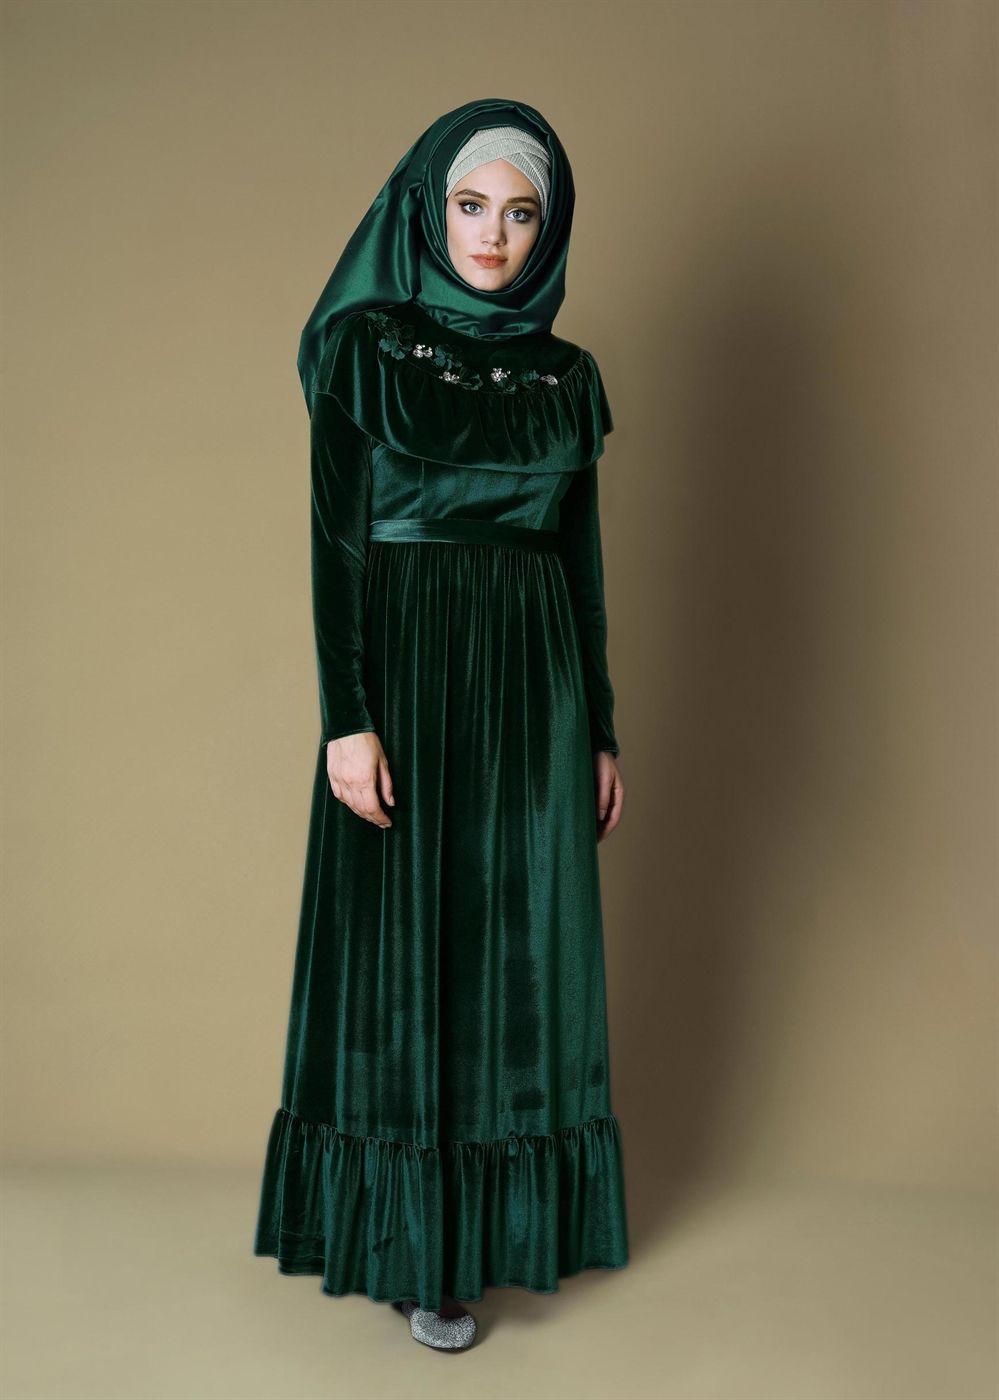 82eeac1029394 4722 NEW DESTİNY ELBİSE 36/42 - ZÜMRÜT Türban Kıyafetler, Niqab, Başörtüsü  Modası